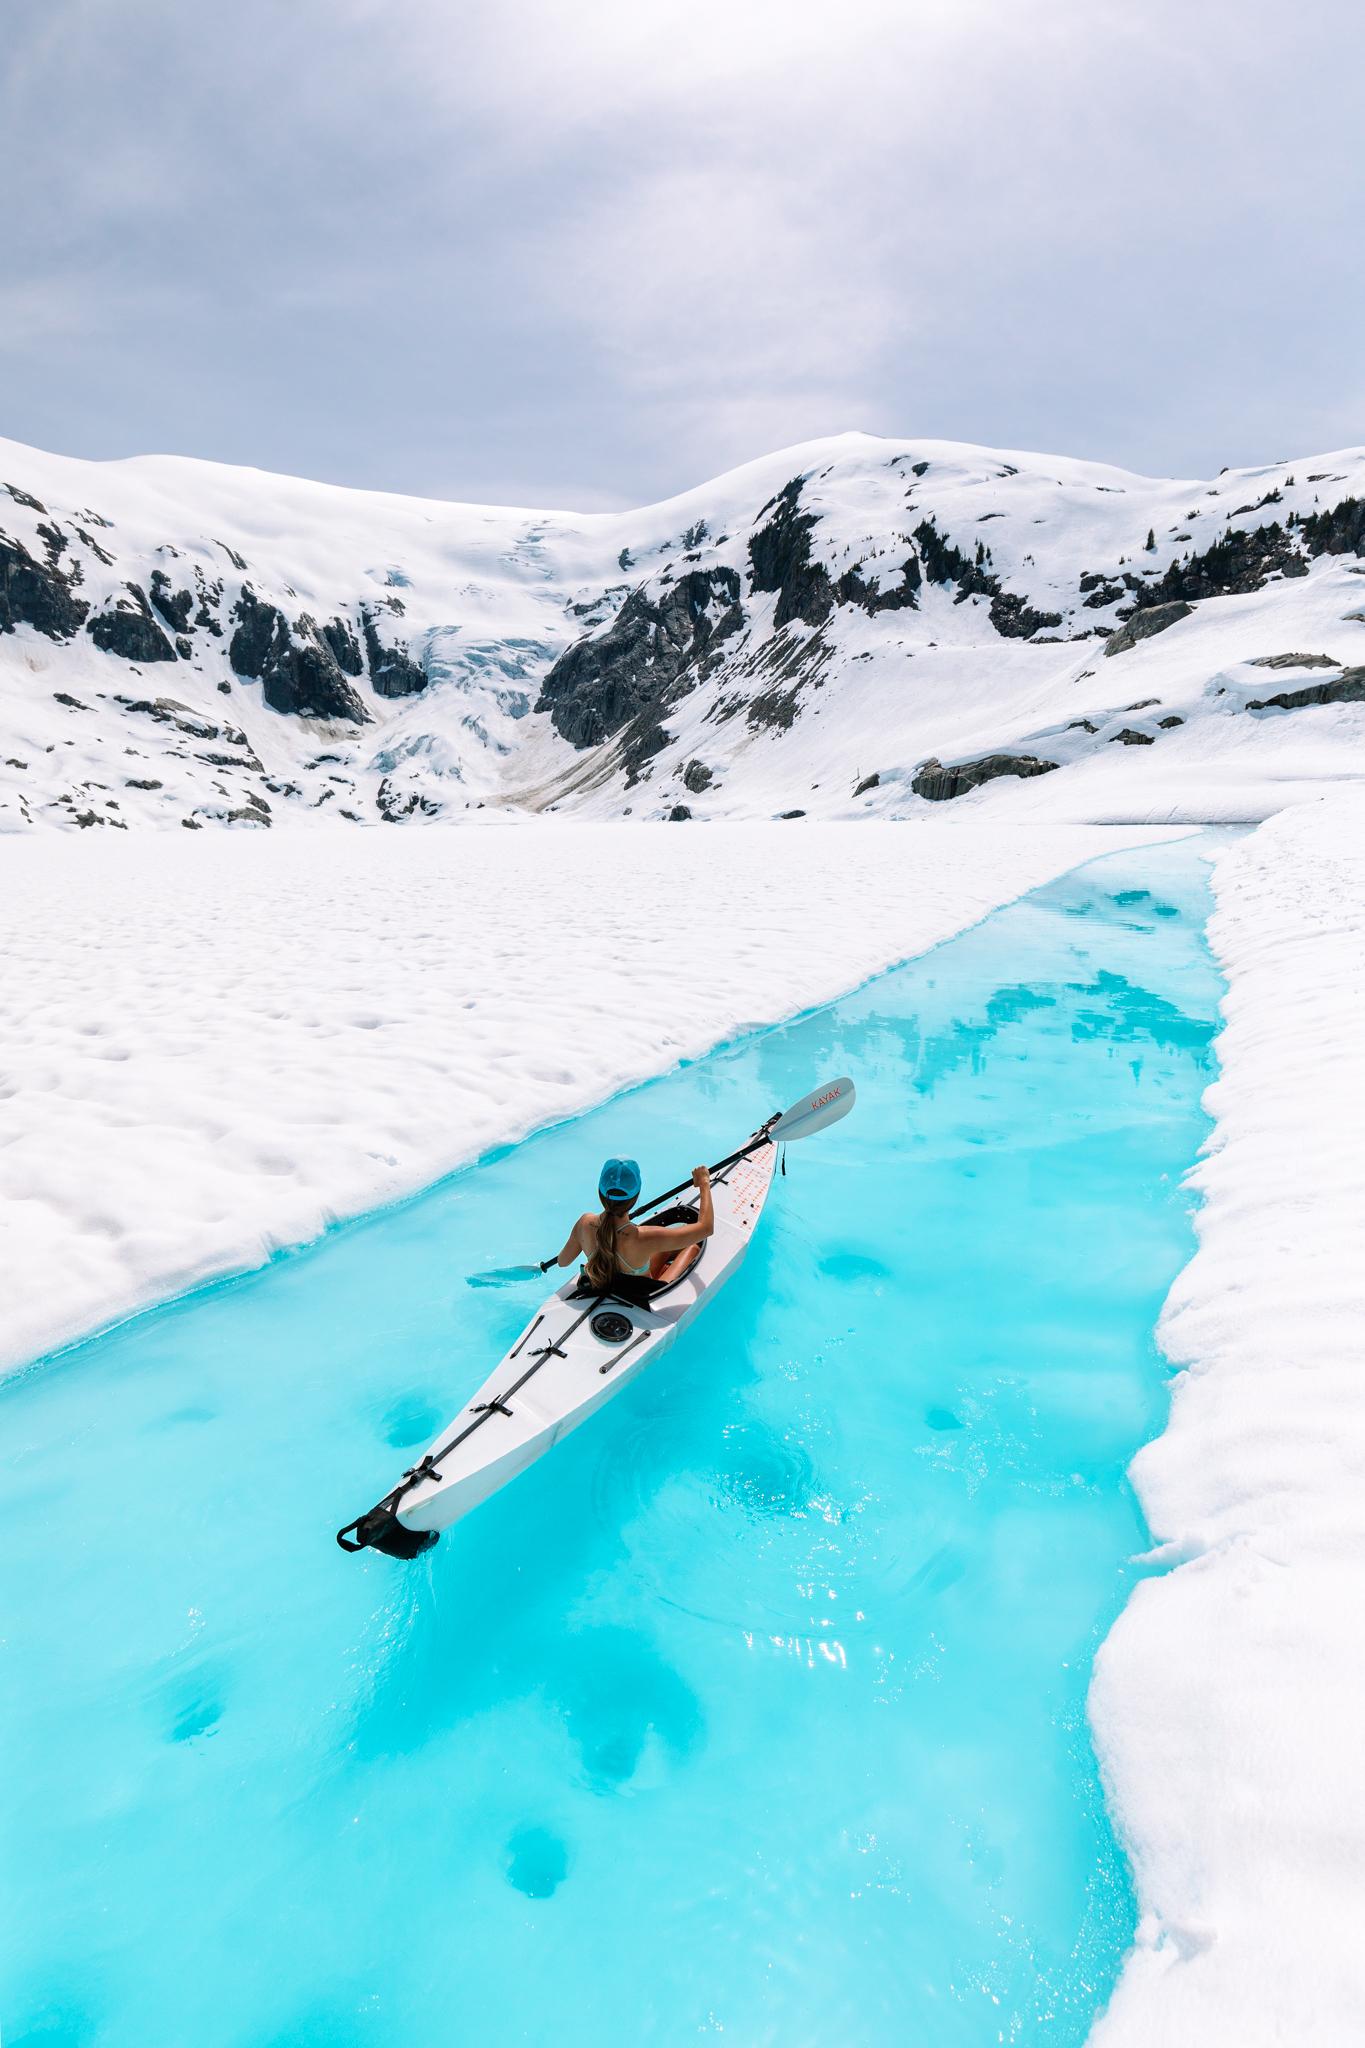 GlacierKayaking_TaylorBurk.jpg